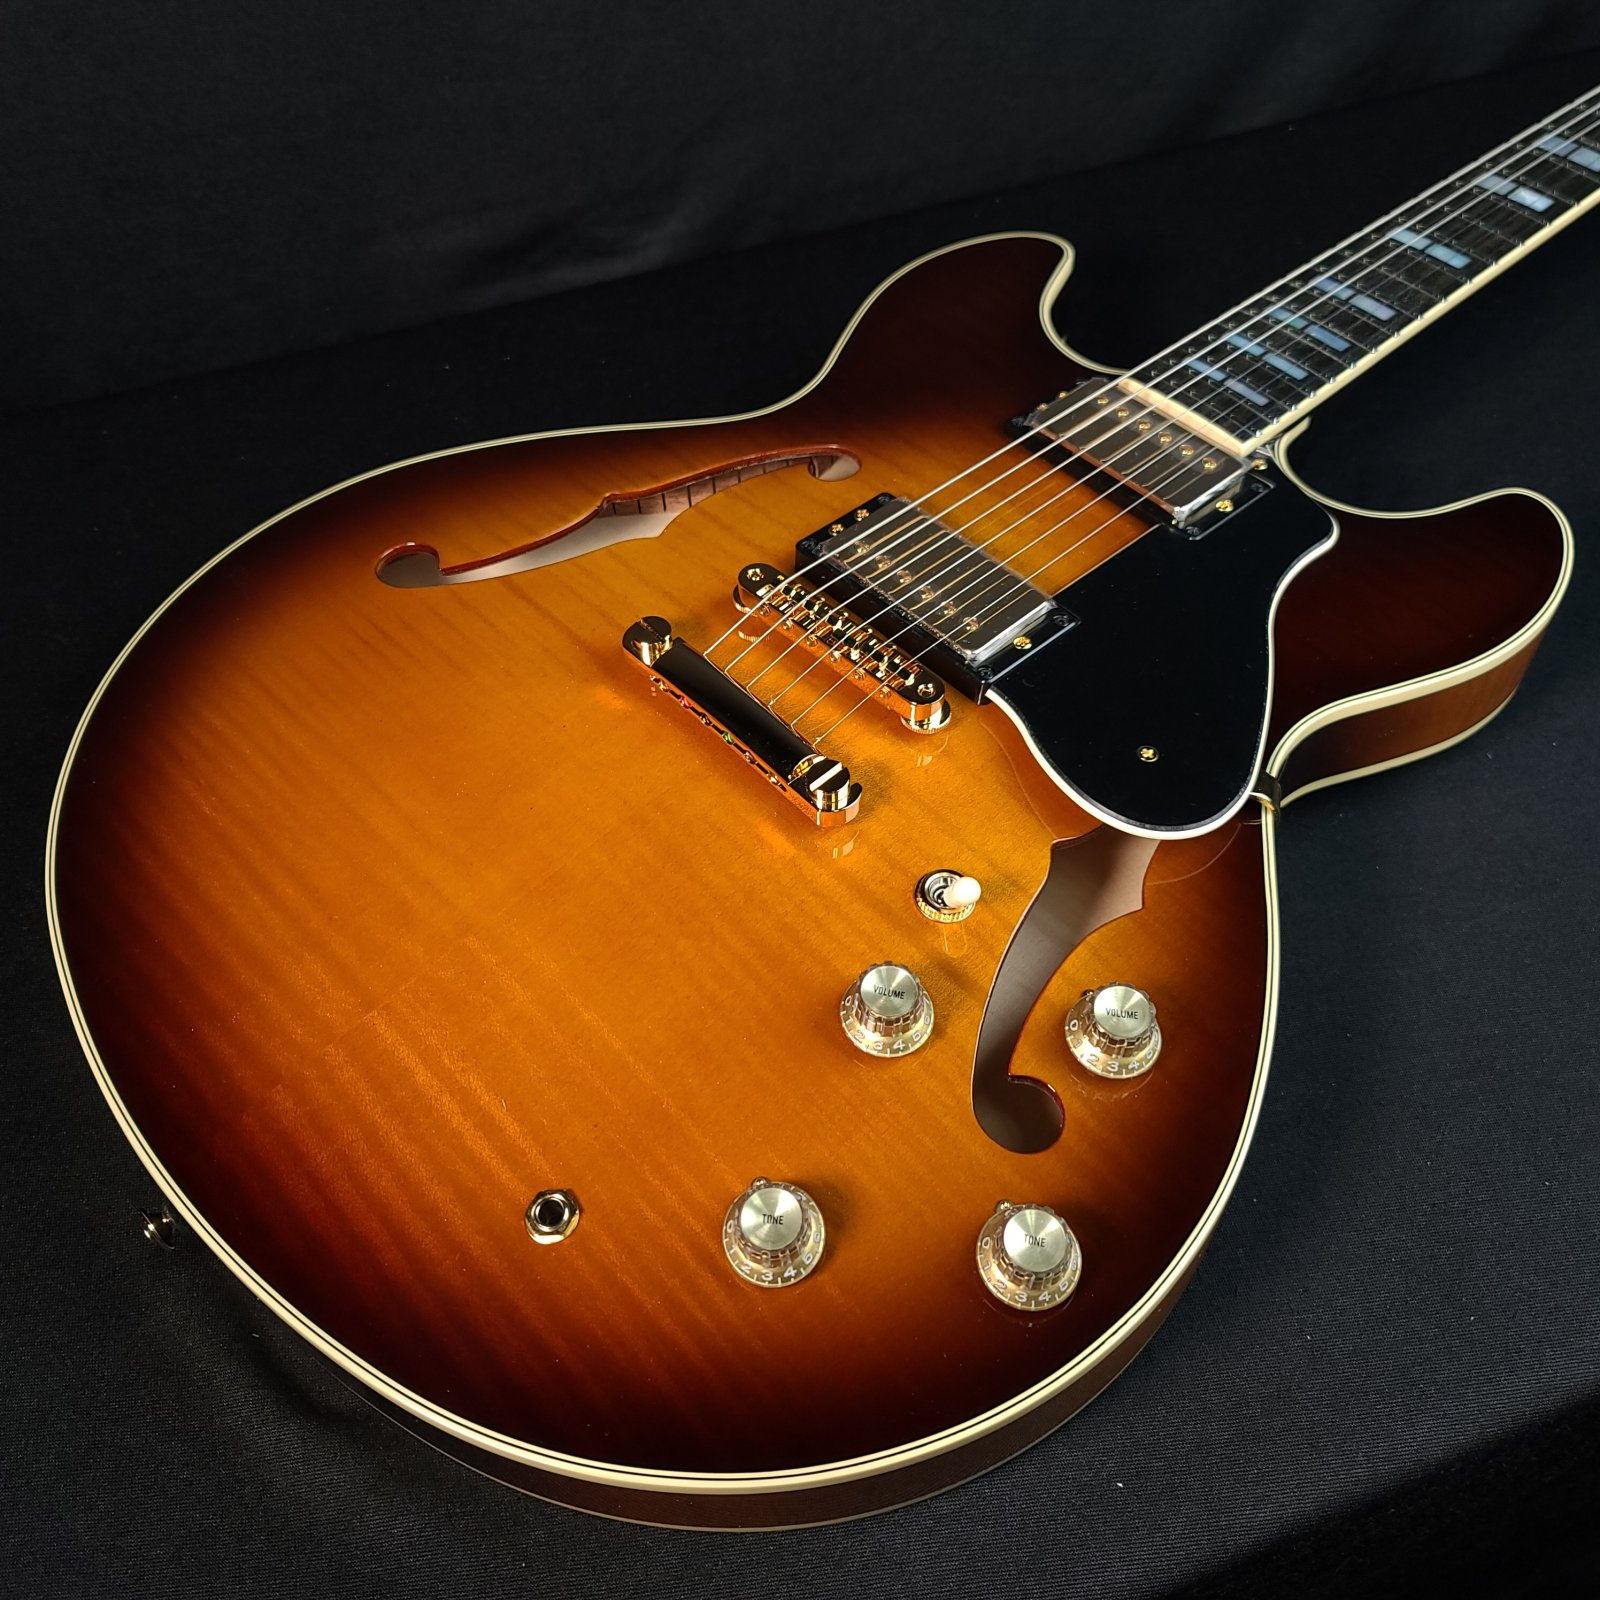 Yamaha SA2200 Brown Sunburst Thinline Guitar With Gator Case